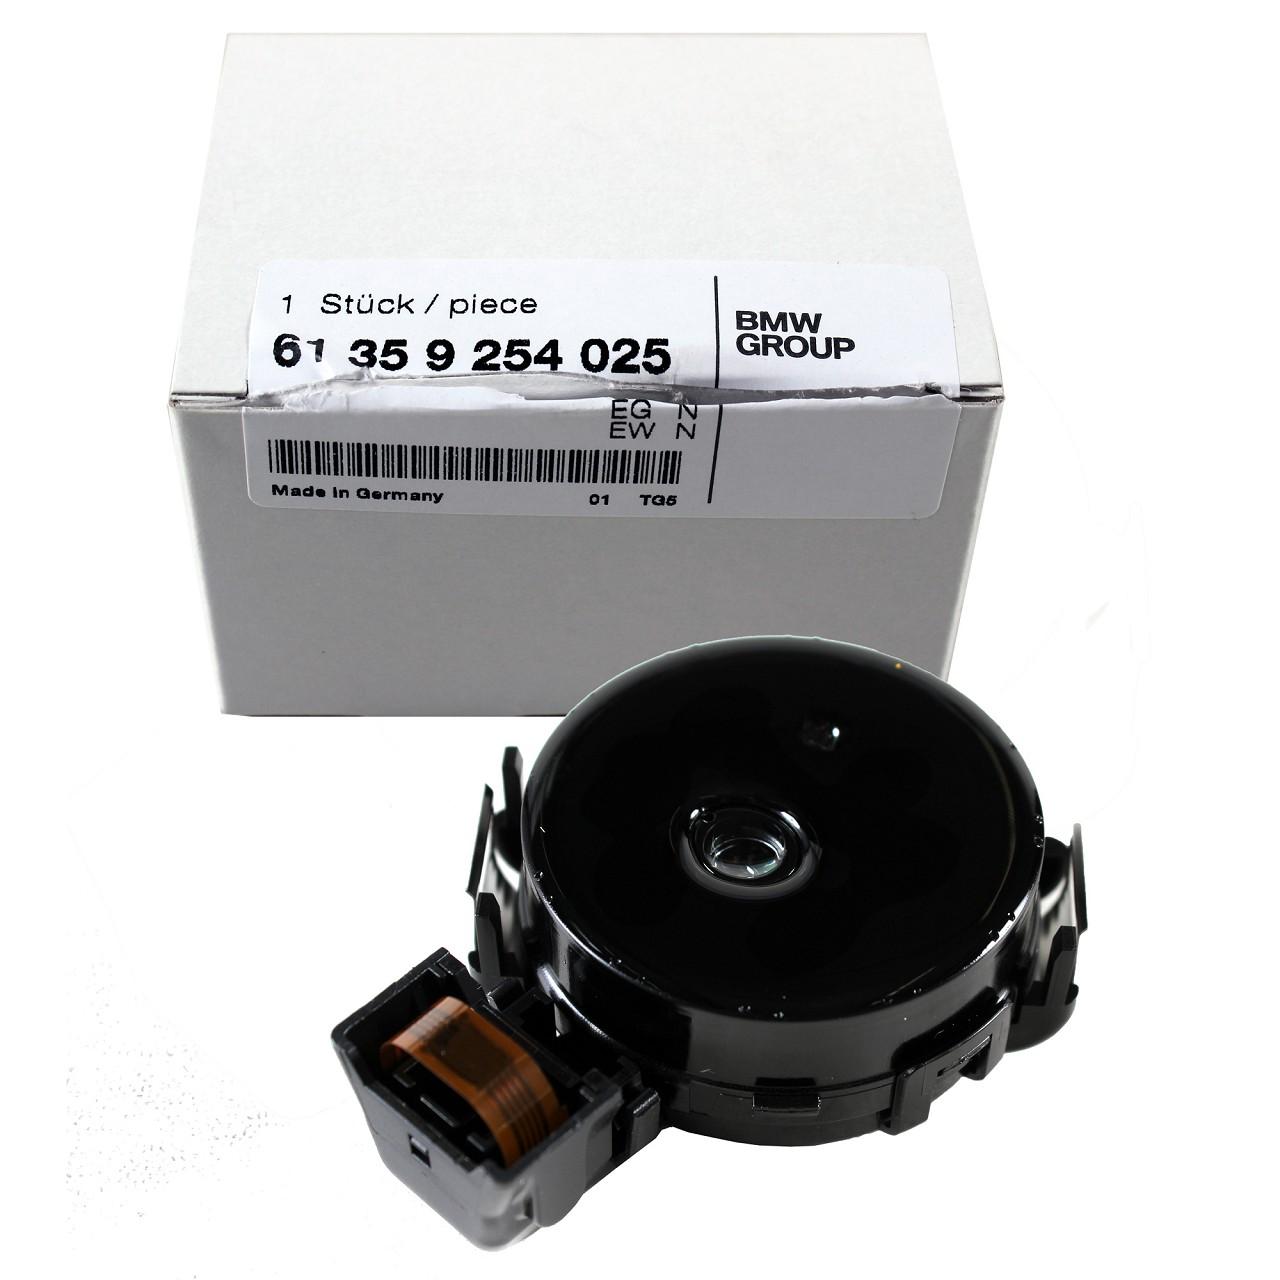 ORIGINAL BMW Anti-Beschlagsensor Regensensor Lichtsensor Solarsensor 61359254025